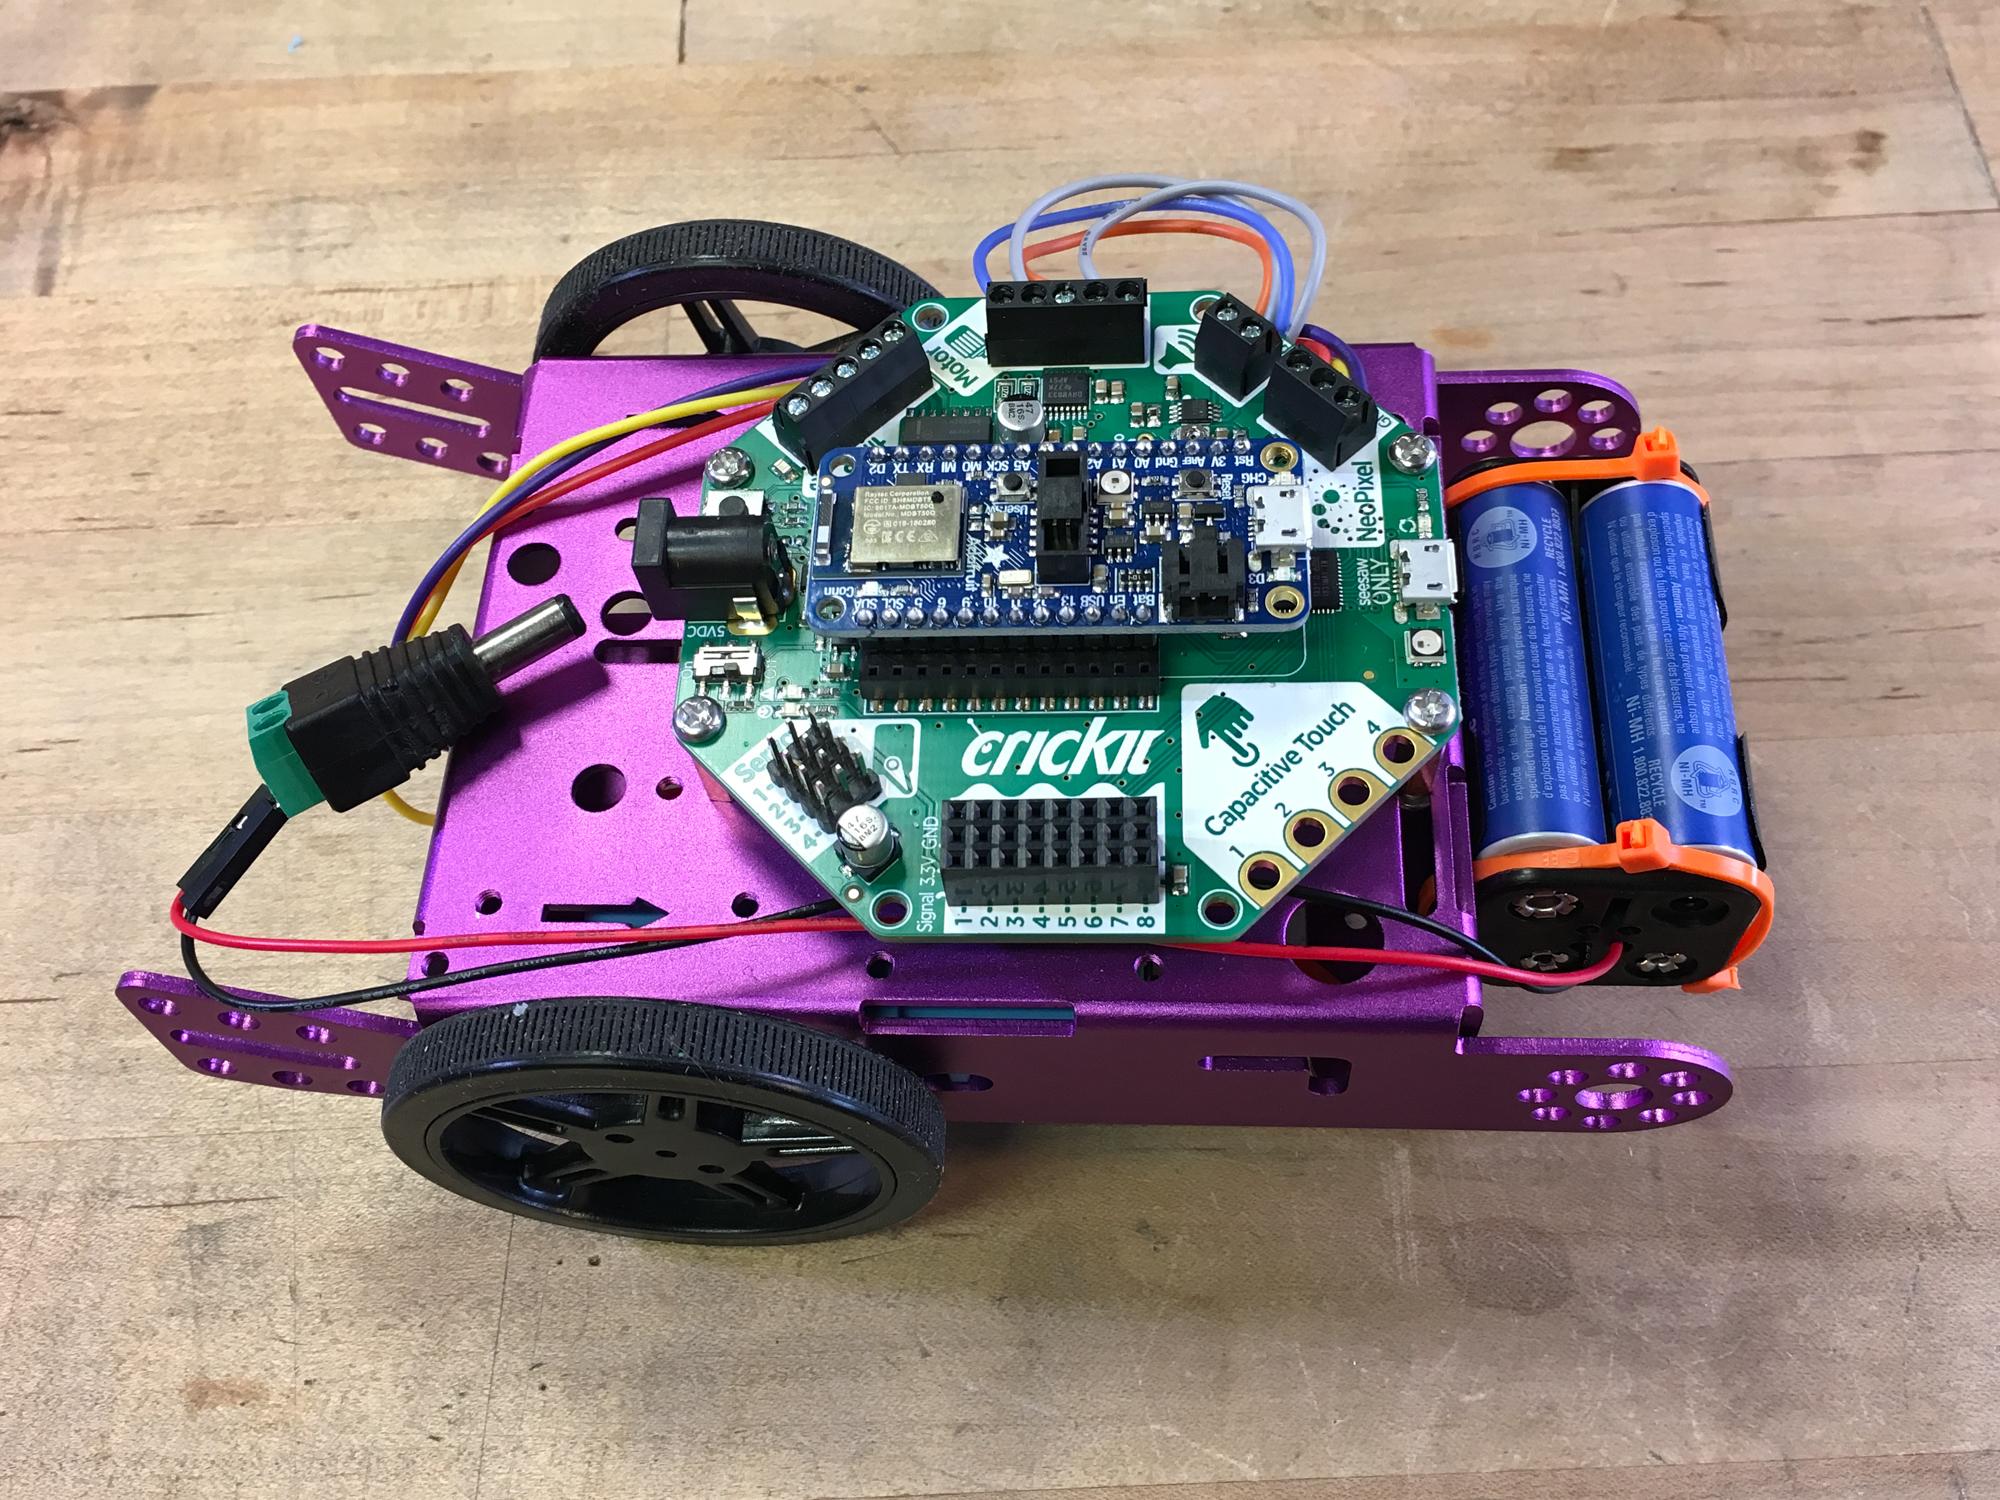 robotics___cnc_IMG_6585_2k.jpg